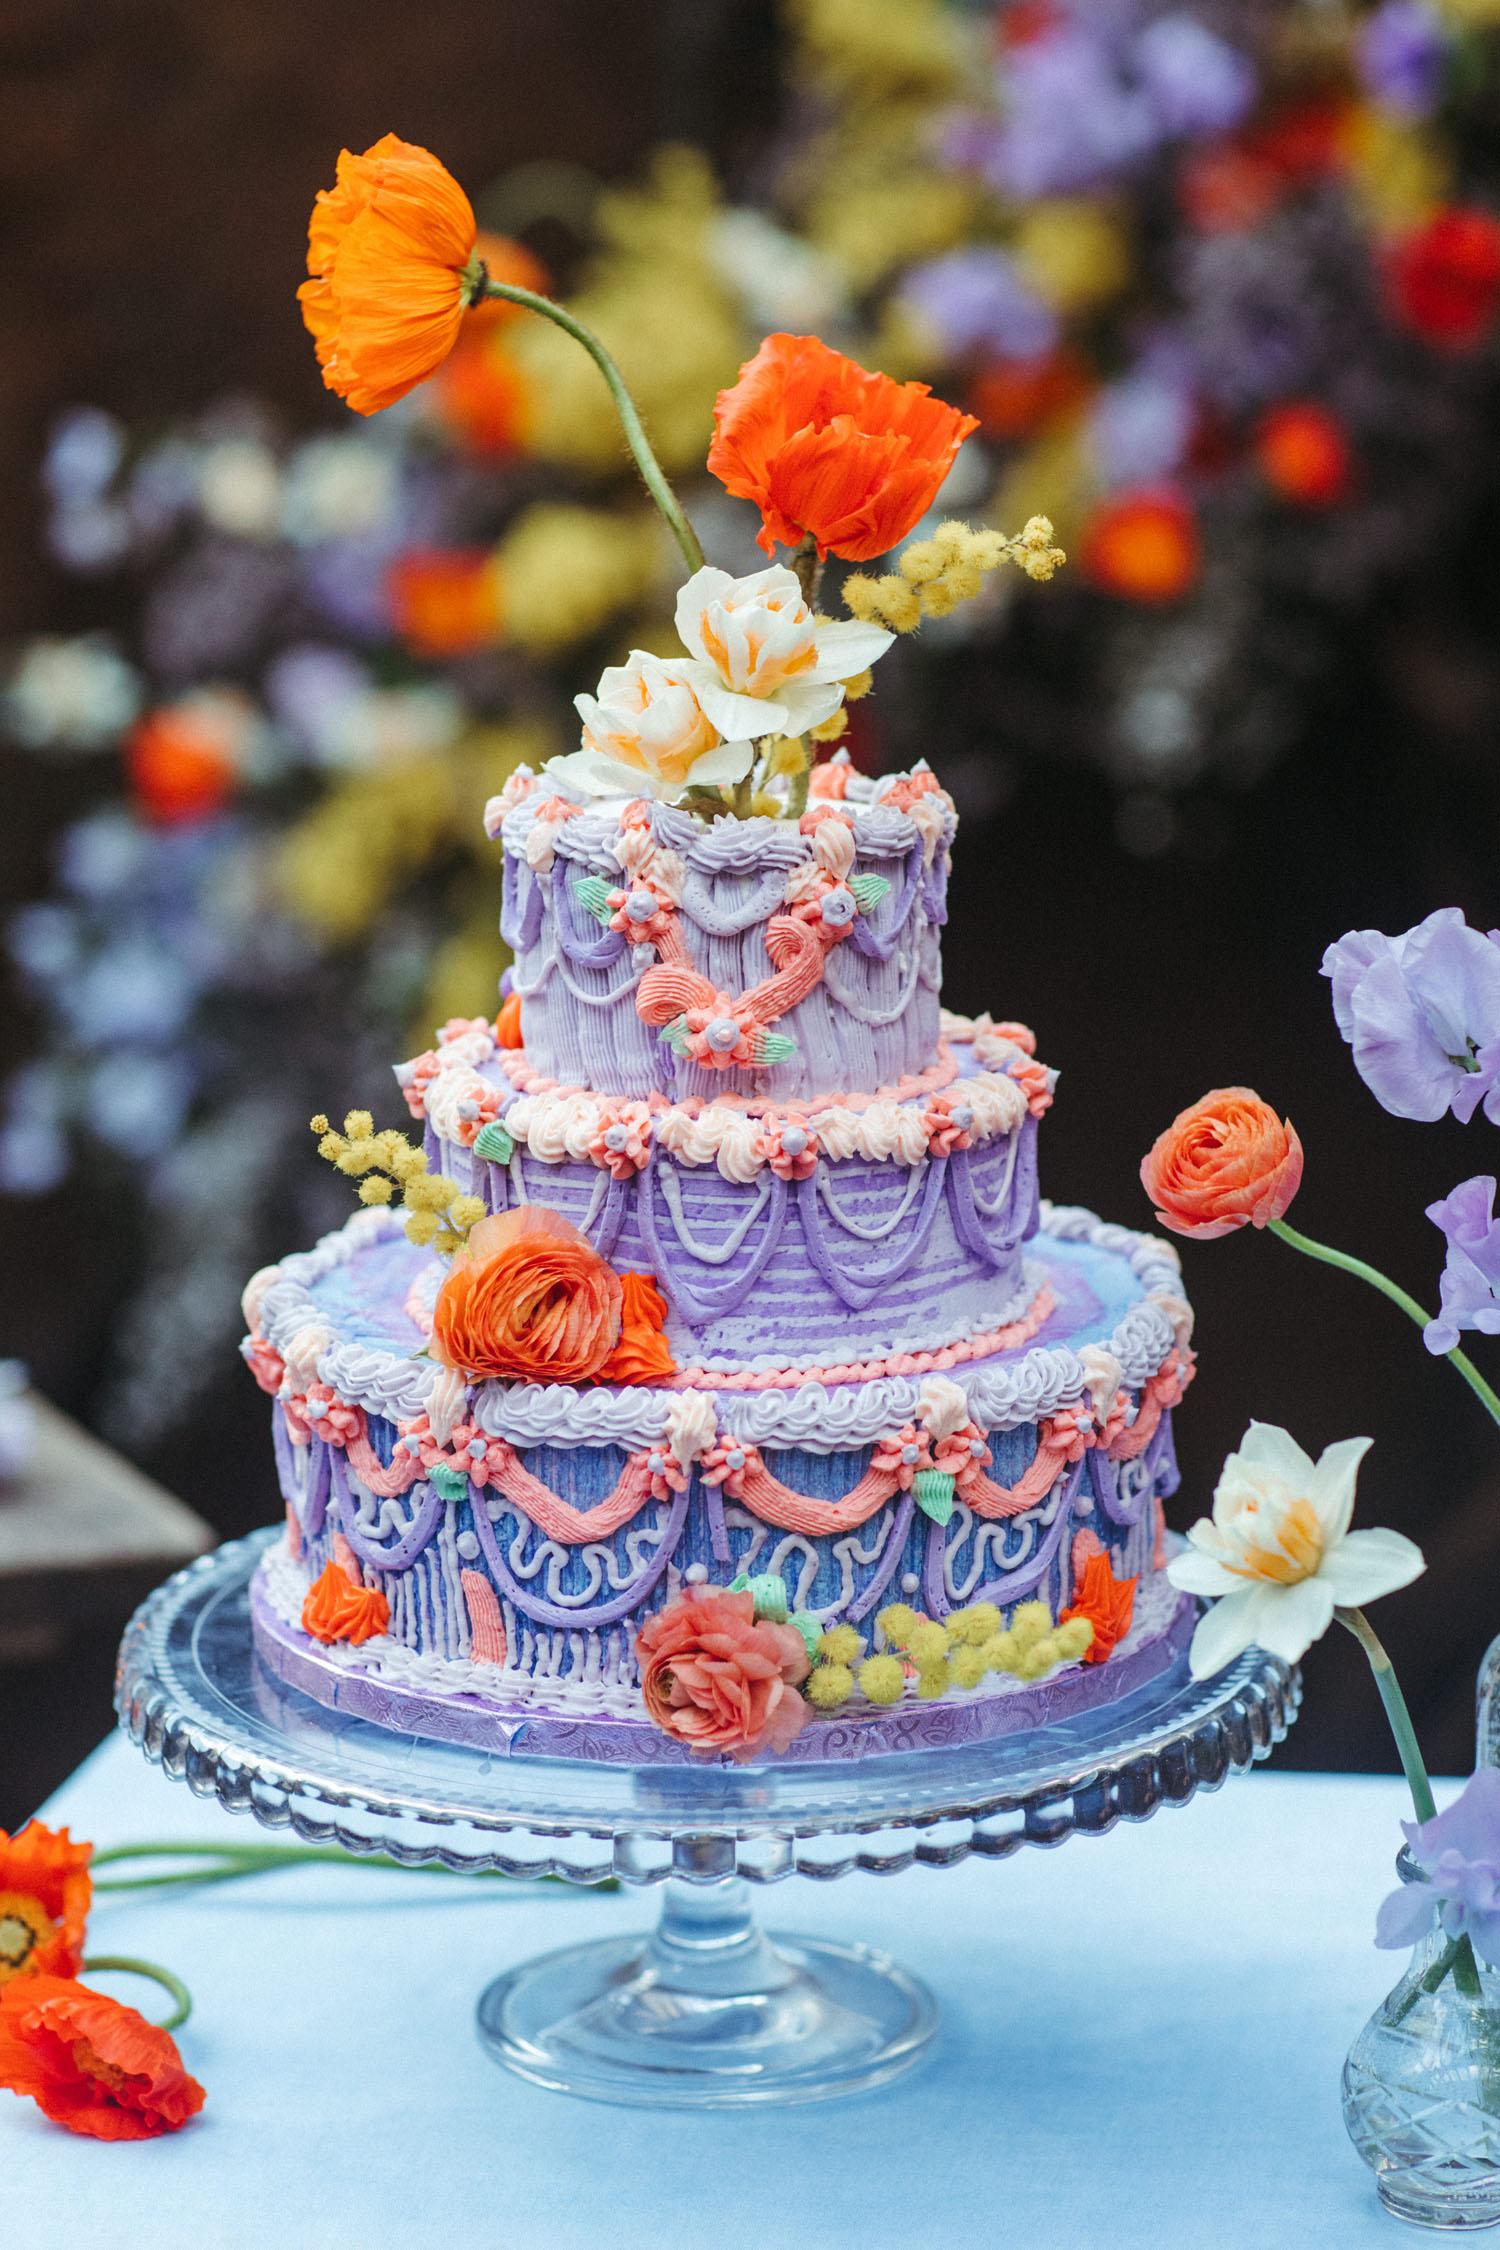 Colorful Icing Wedding Cake